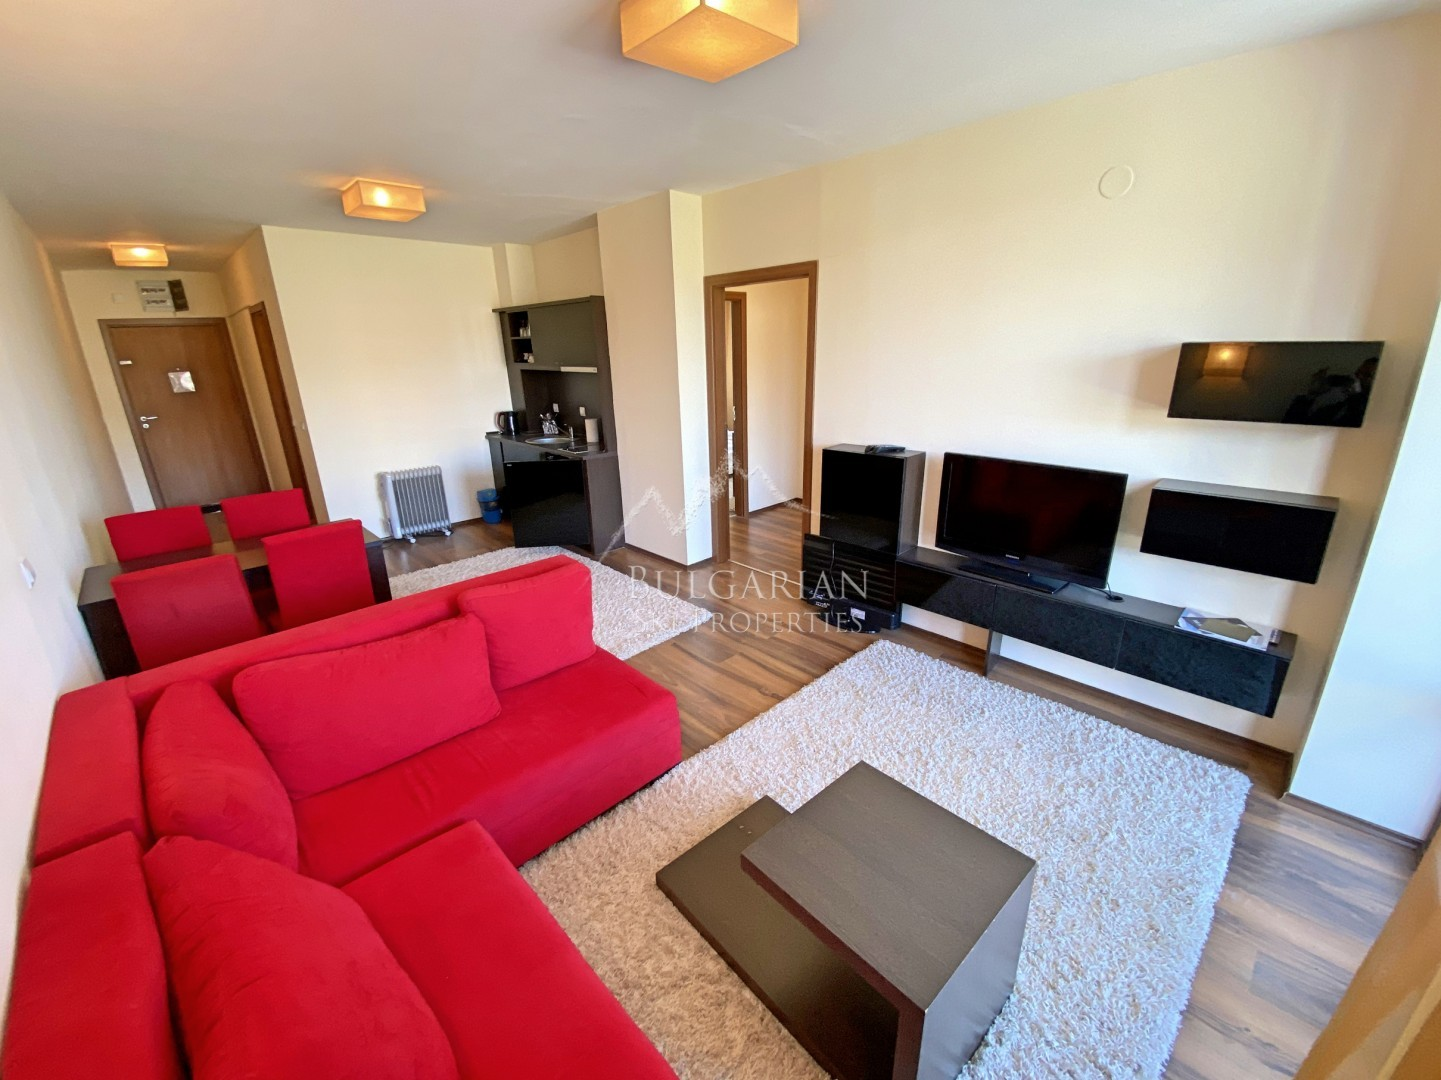 Bansko: two-bedroom apartment for sale in St George Ski & Spa